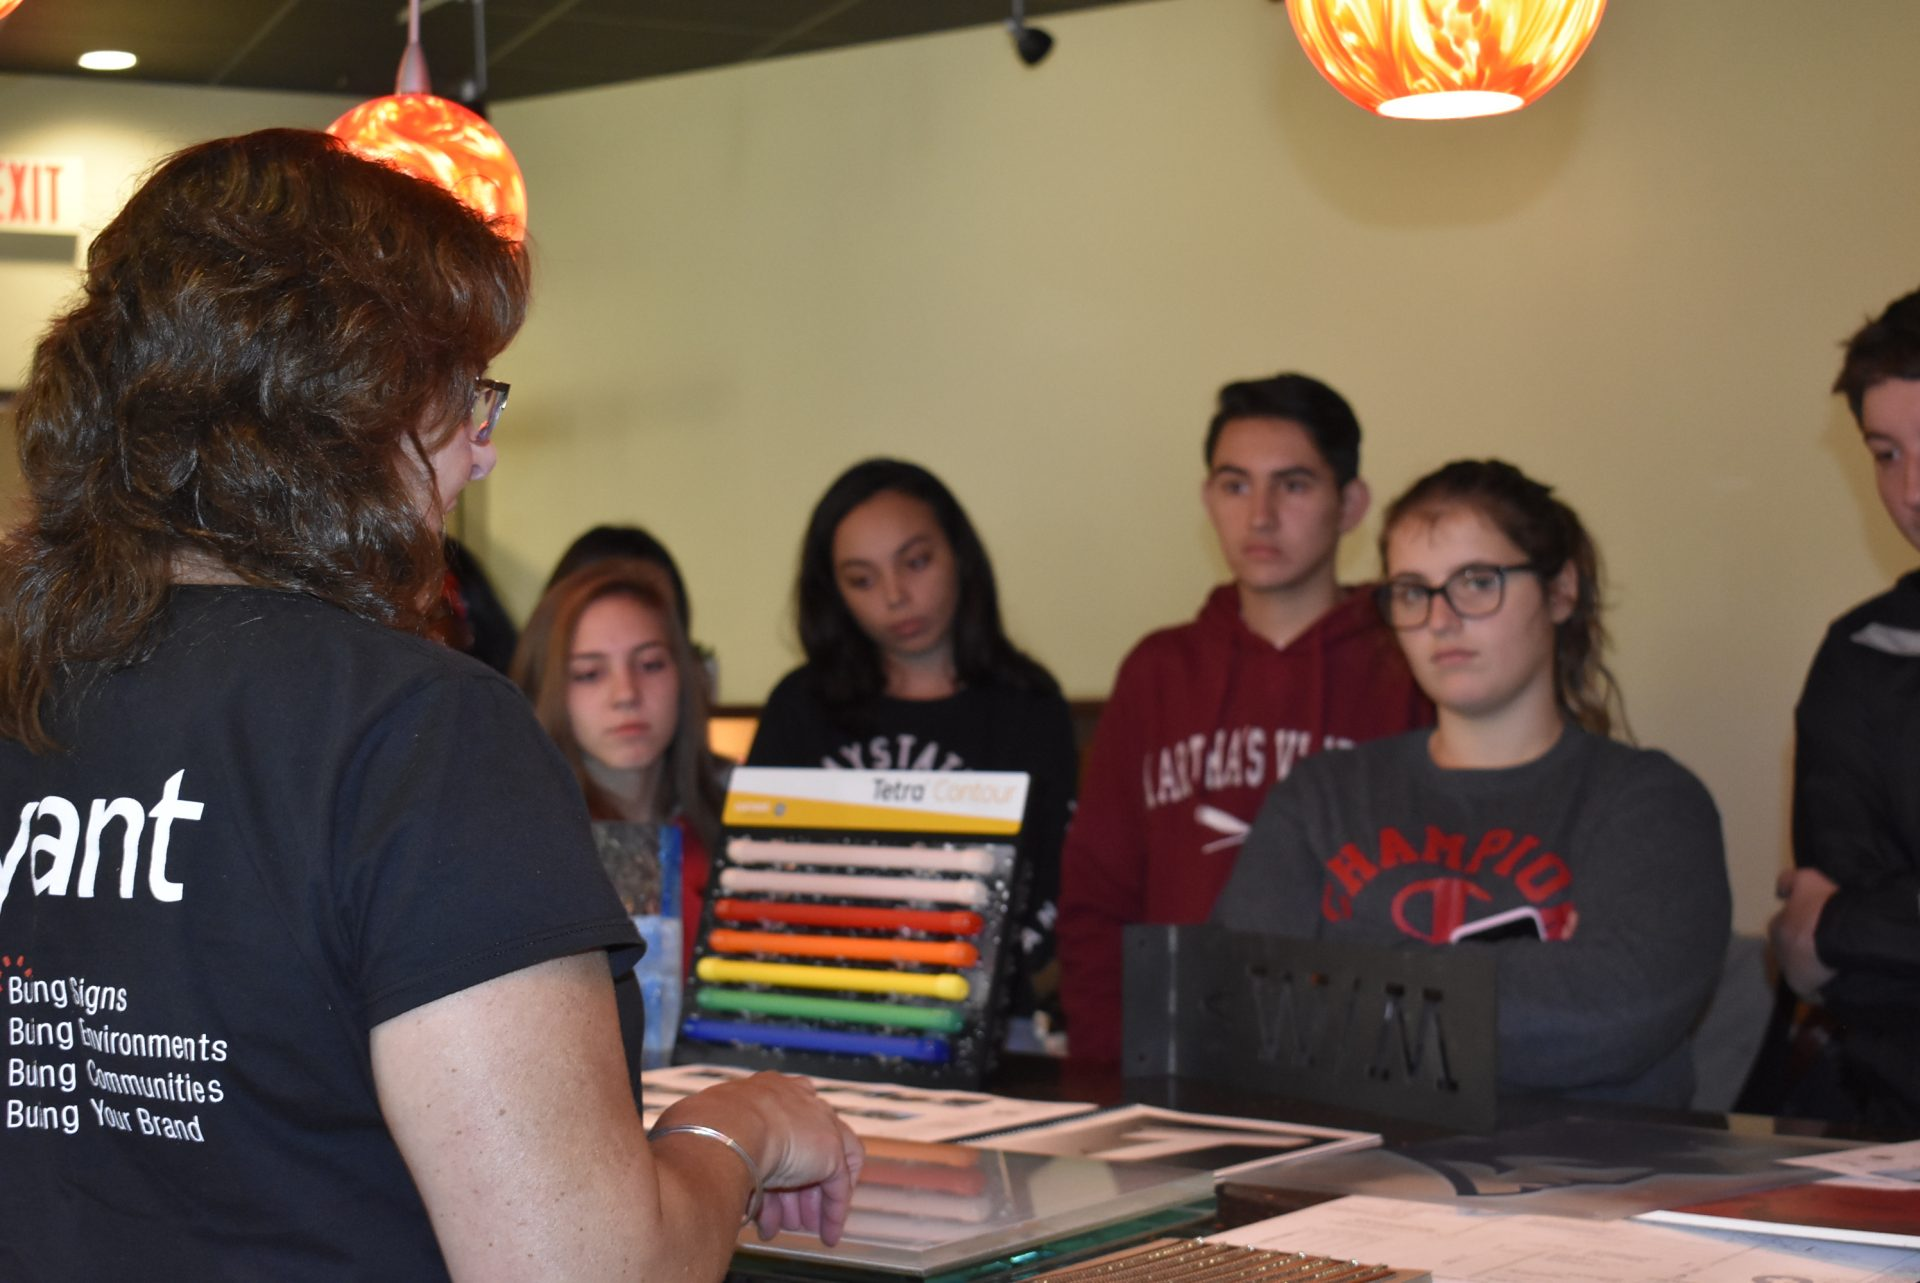 Architectural Design Students Listening to Presenter